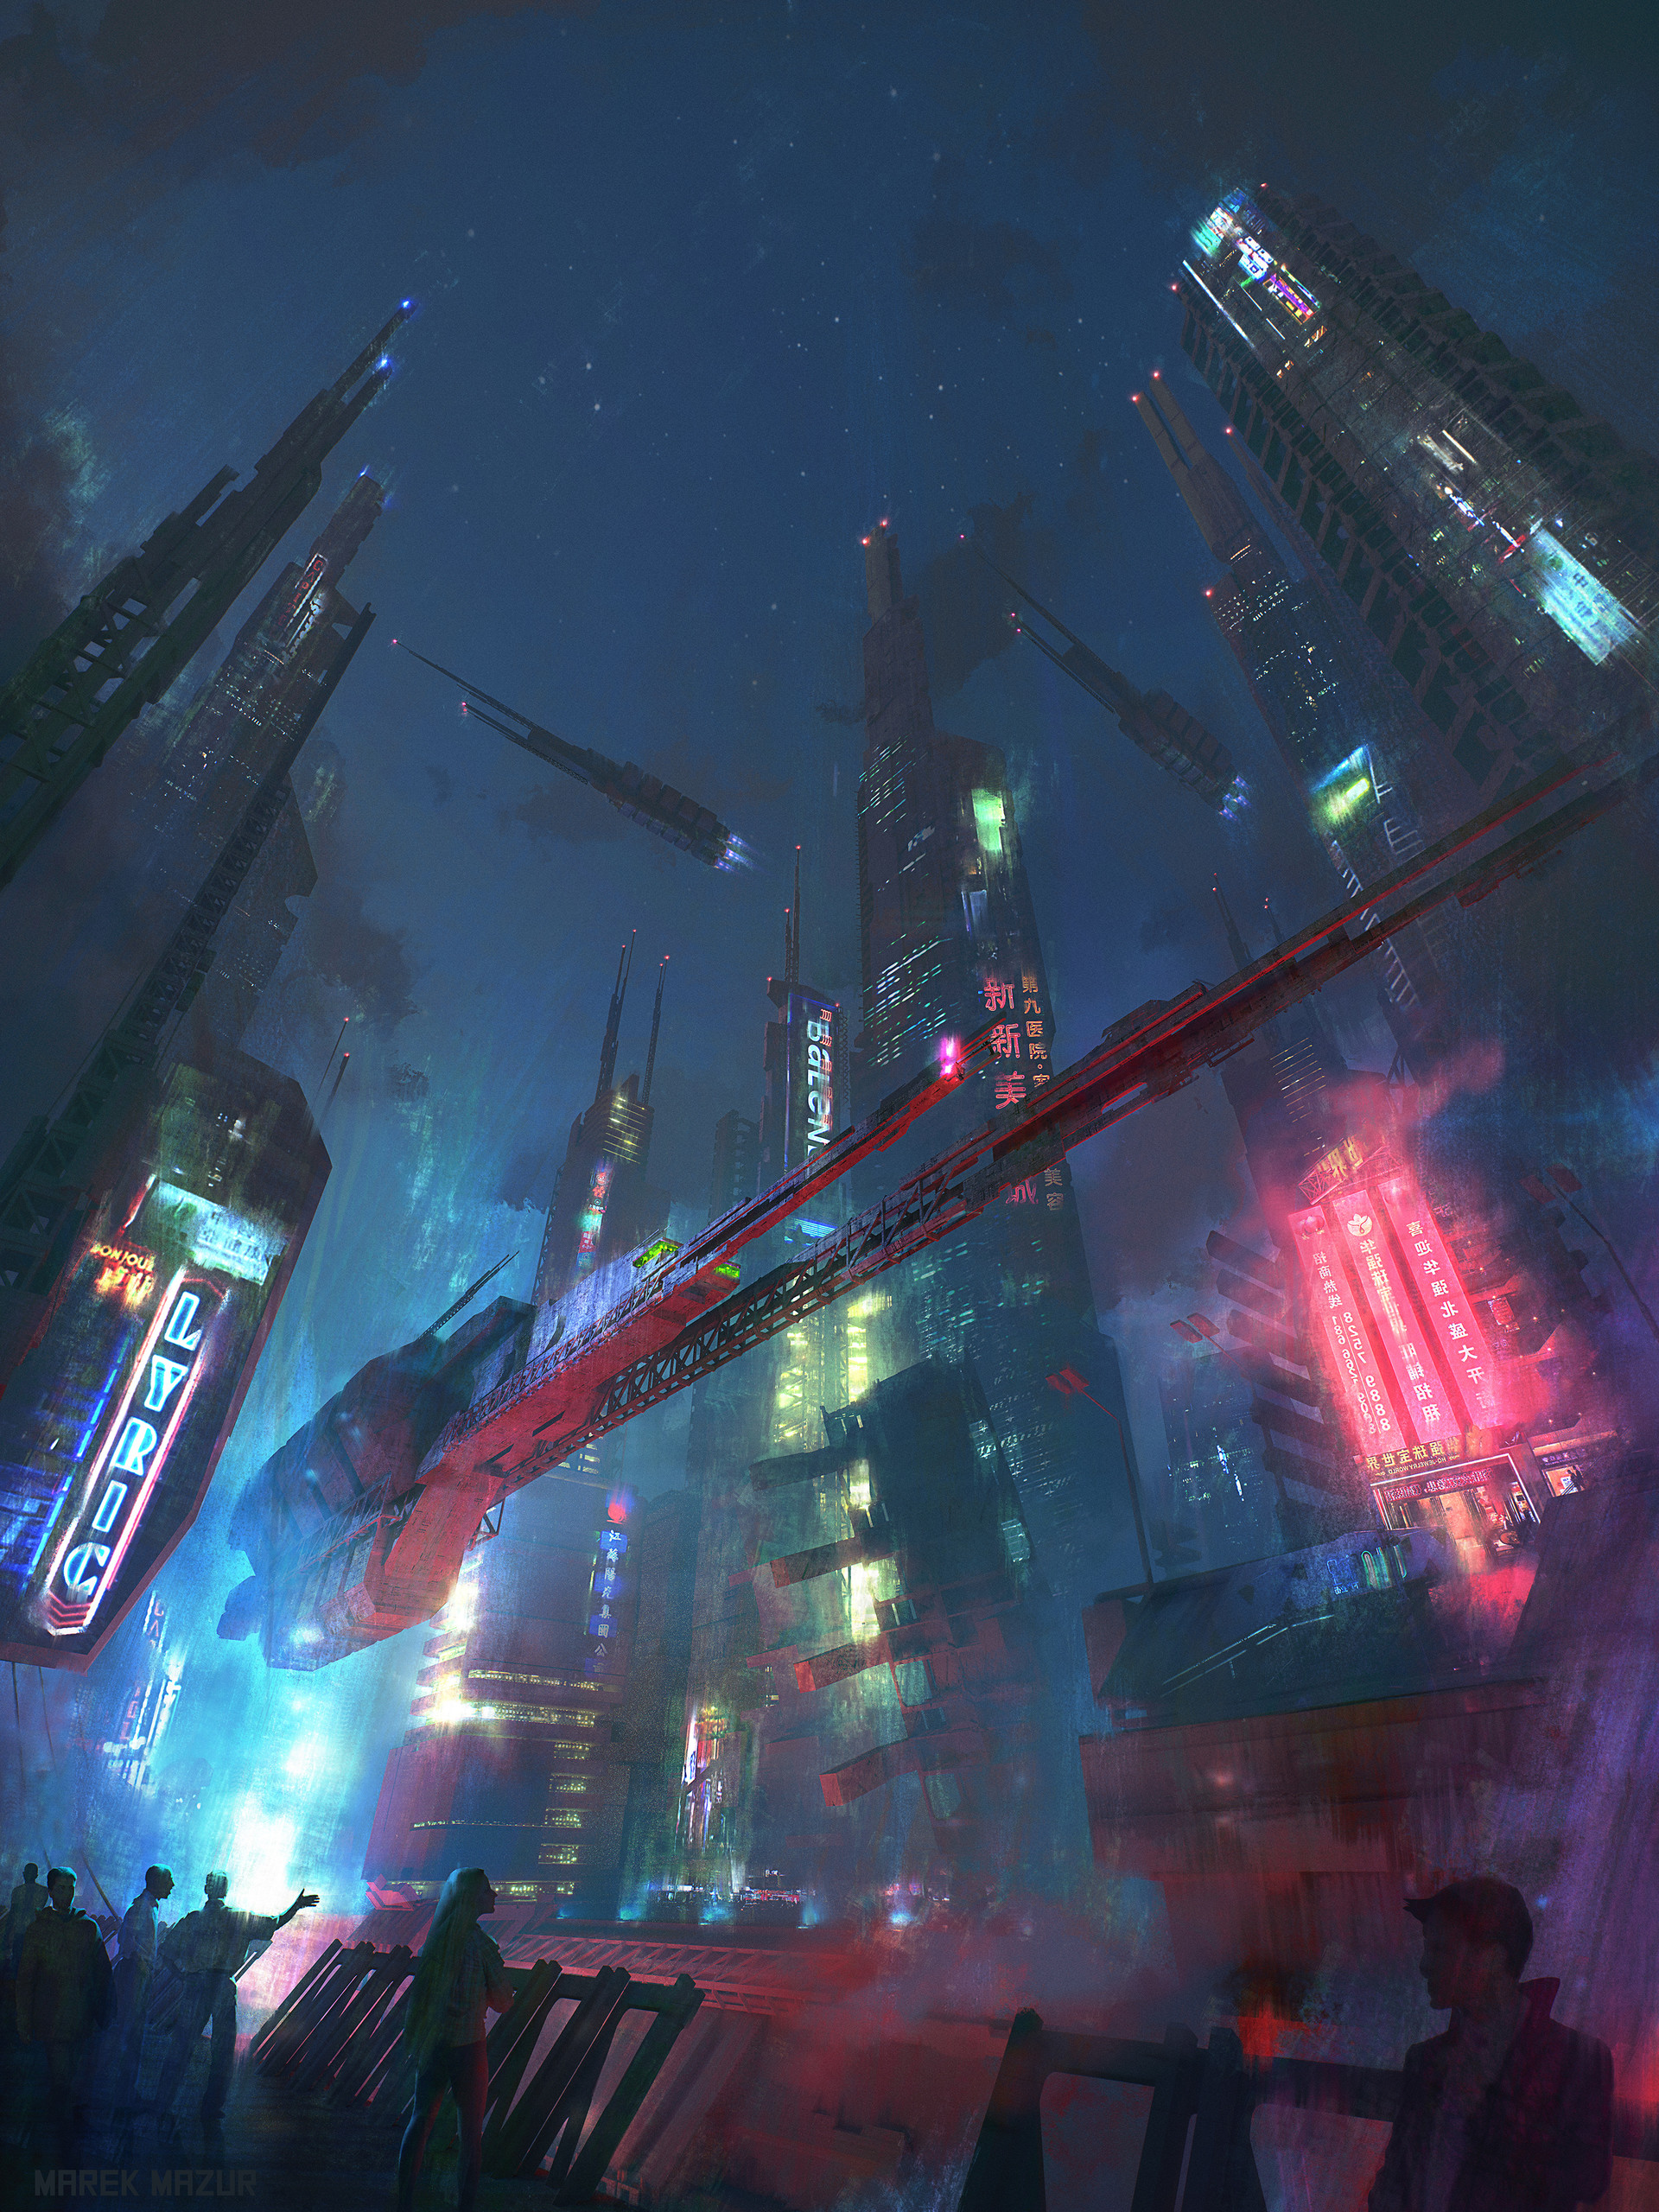 General 1920x2560 cyberpunk Marek Mazur digital city futuristic concept art neon science fiction